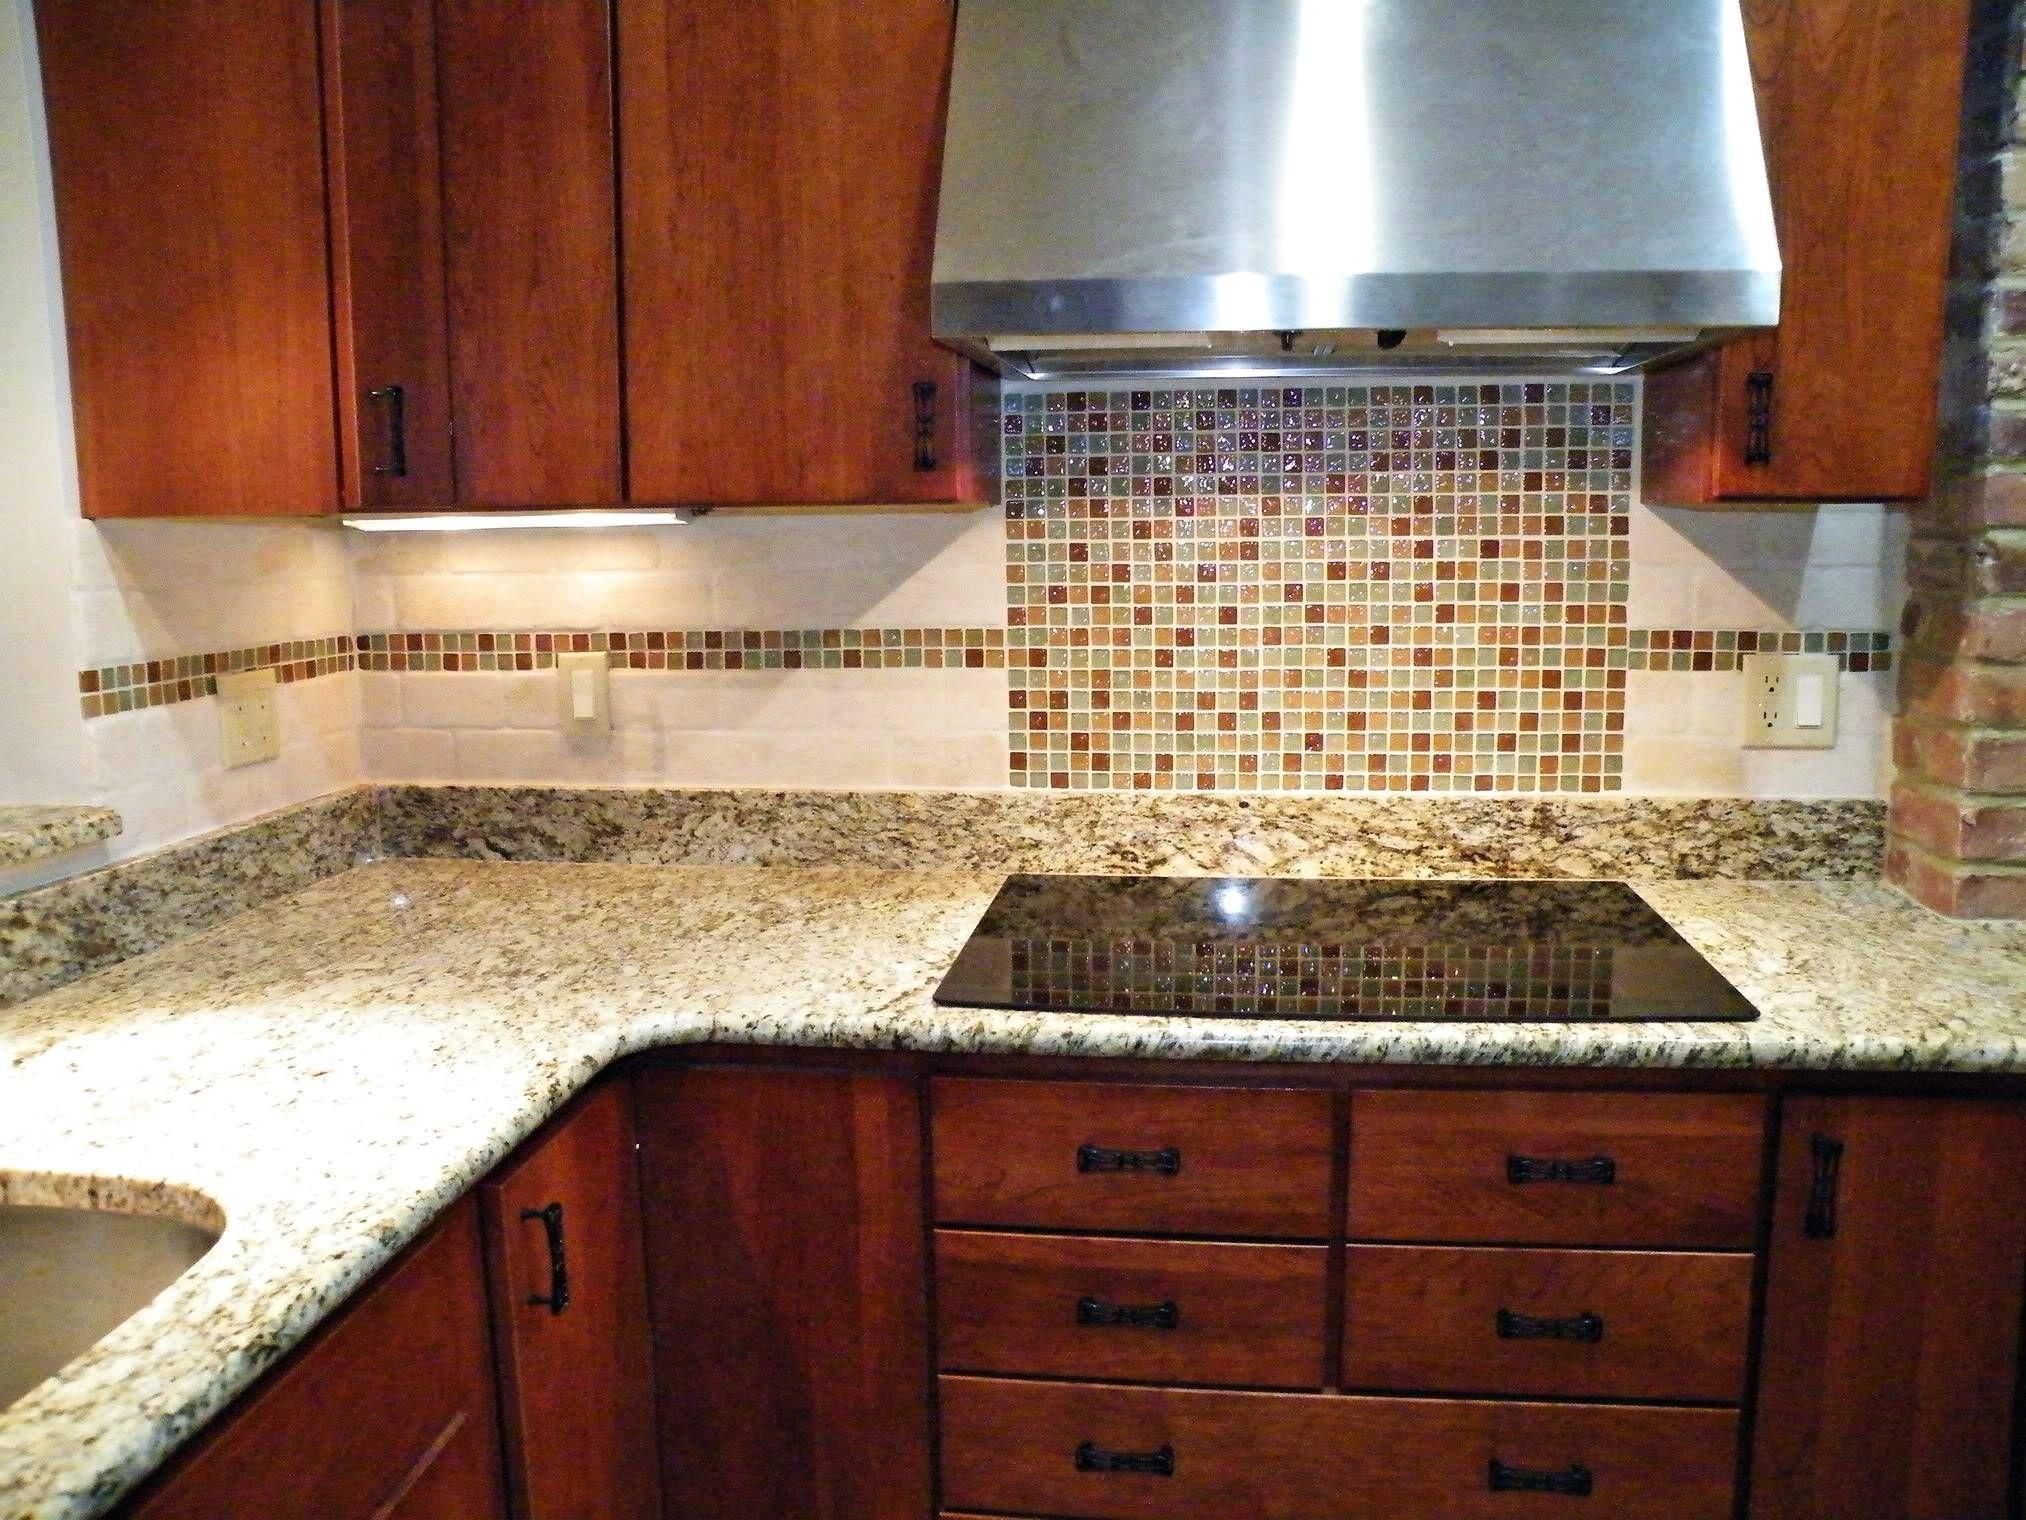 Superbe Kitchen: Glass Tile Backsplash Pictures For Kitchen | Kitchen .